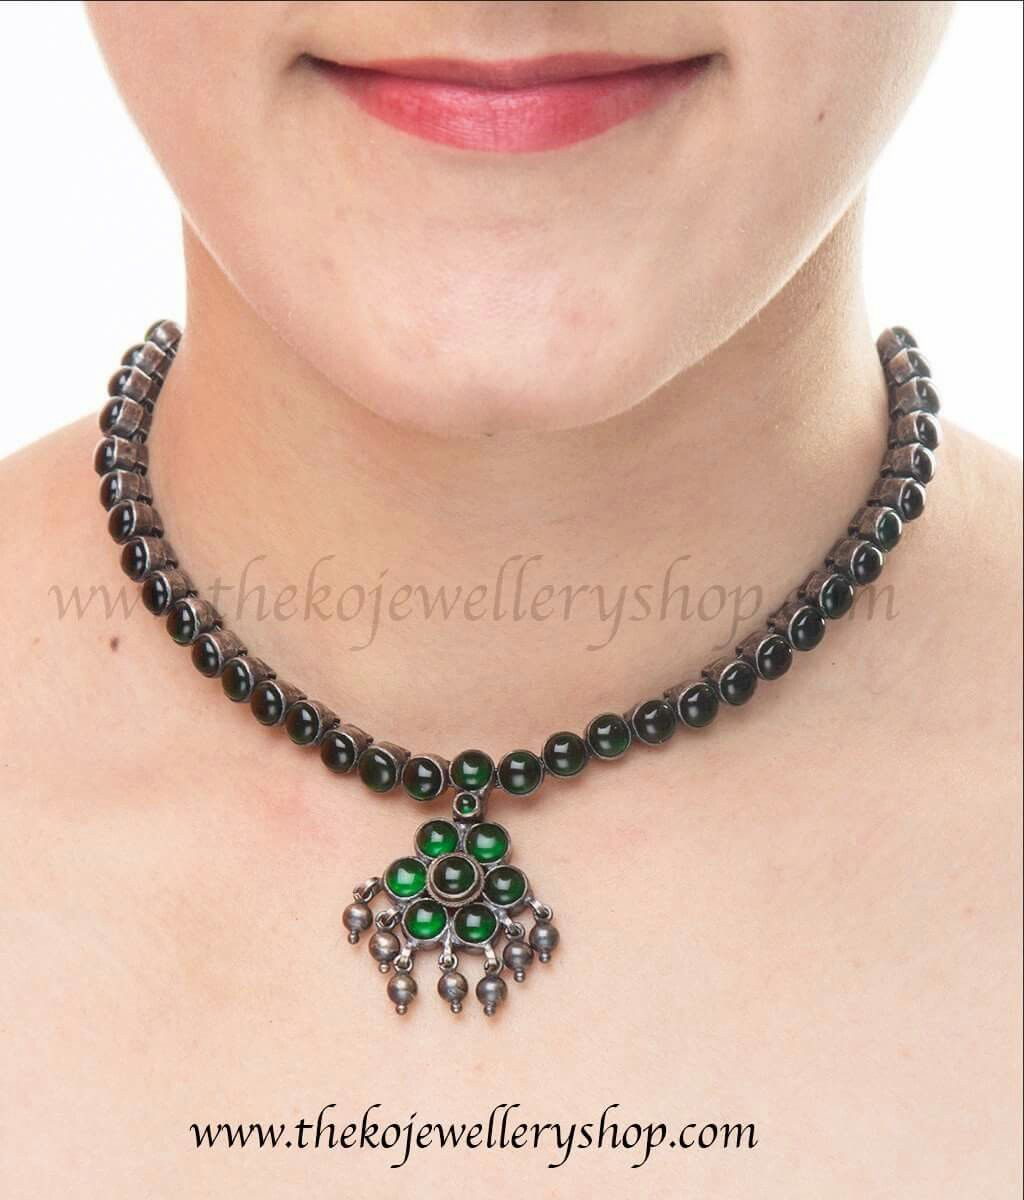 Pin by teju reddy on silver jewellery pinterest silver jewelry